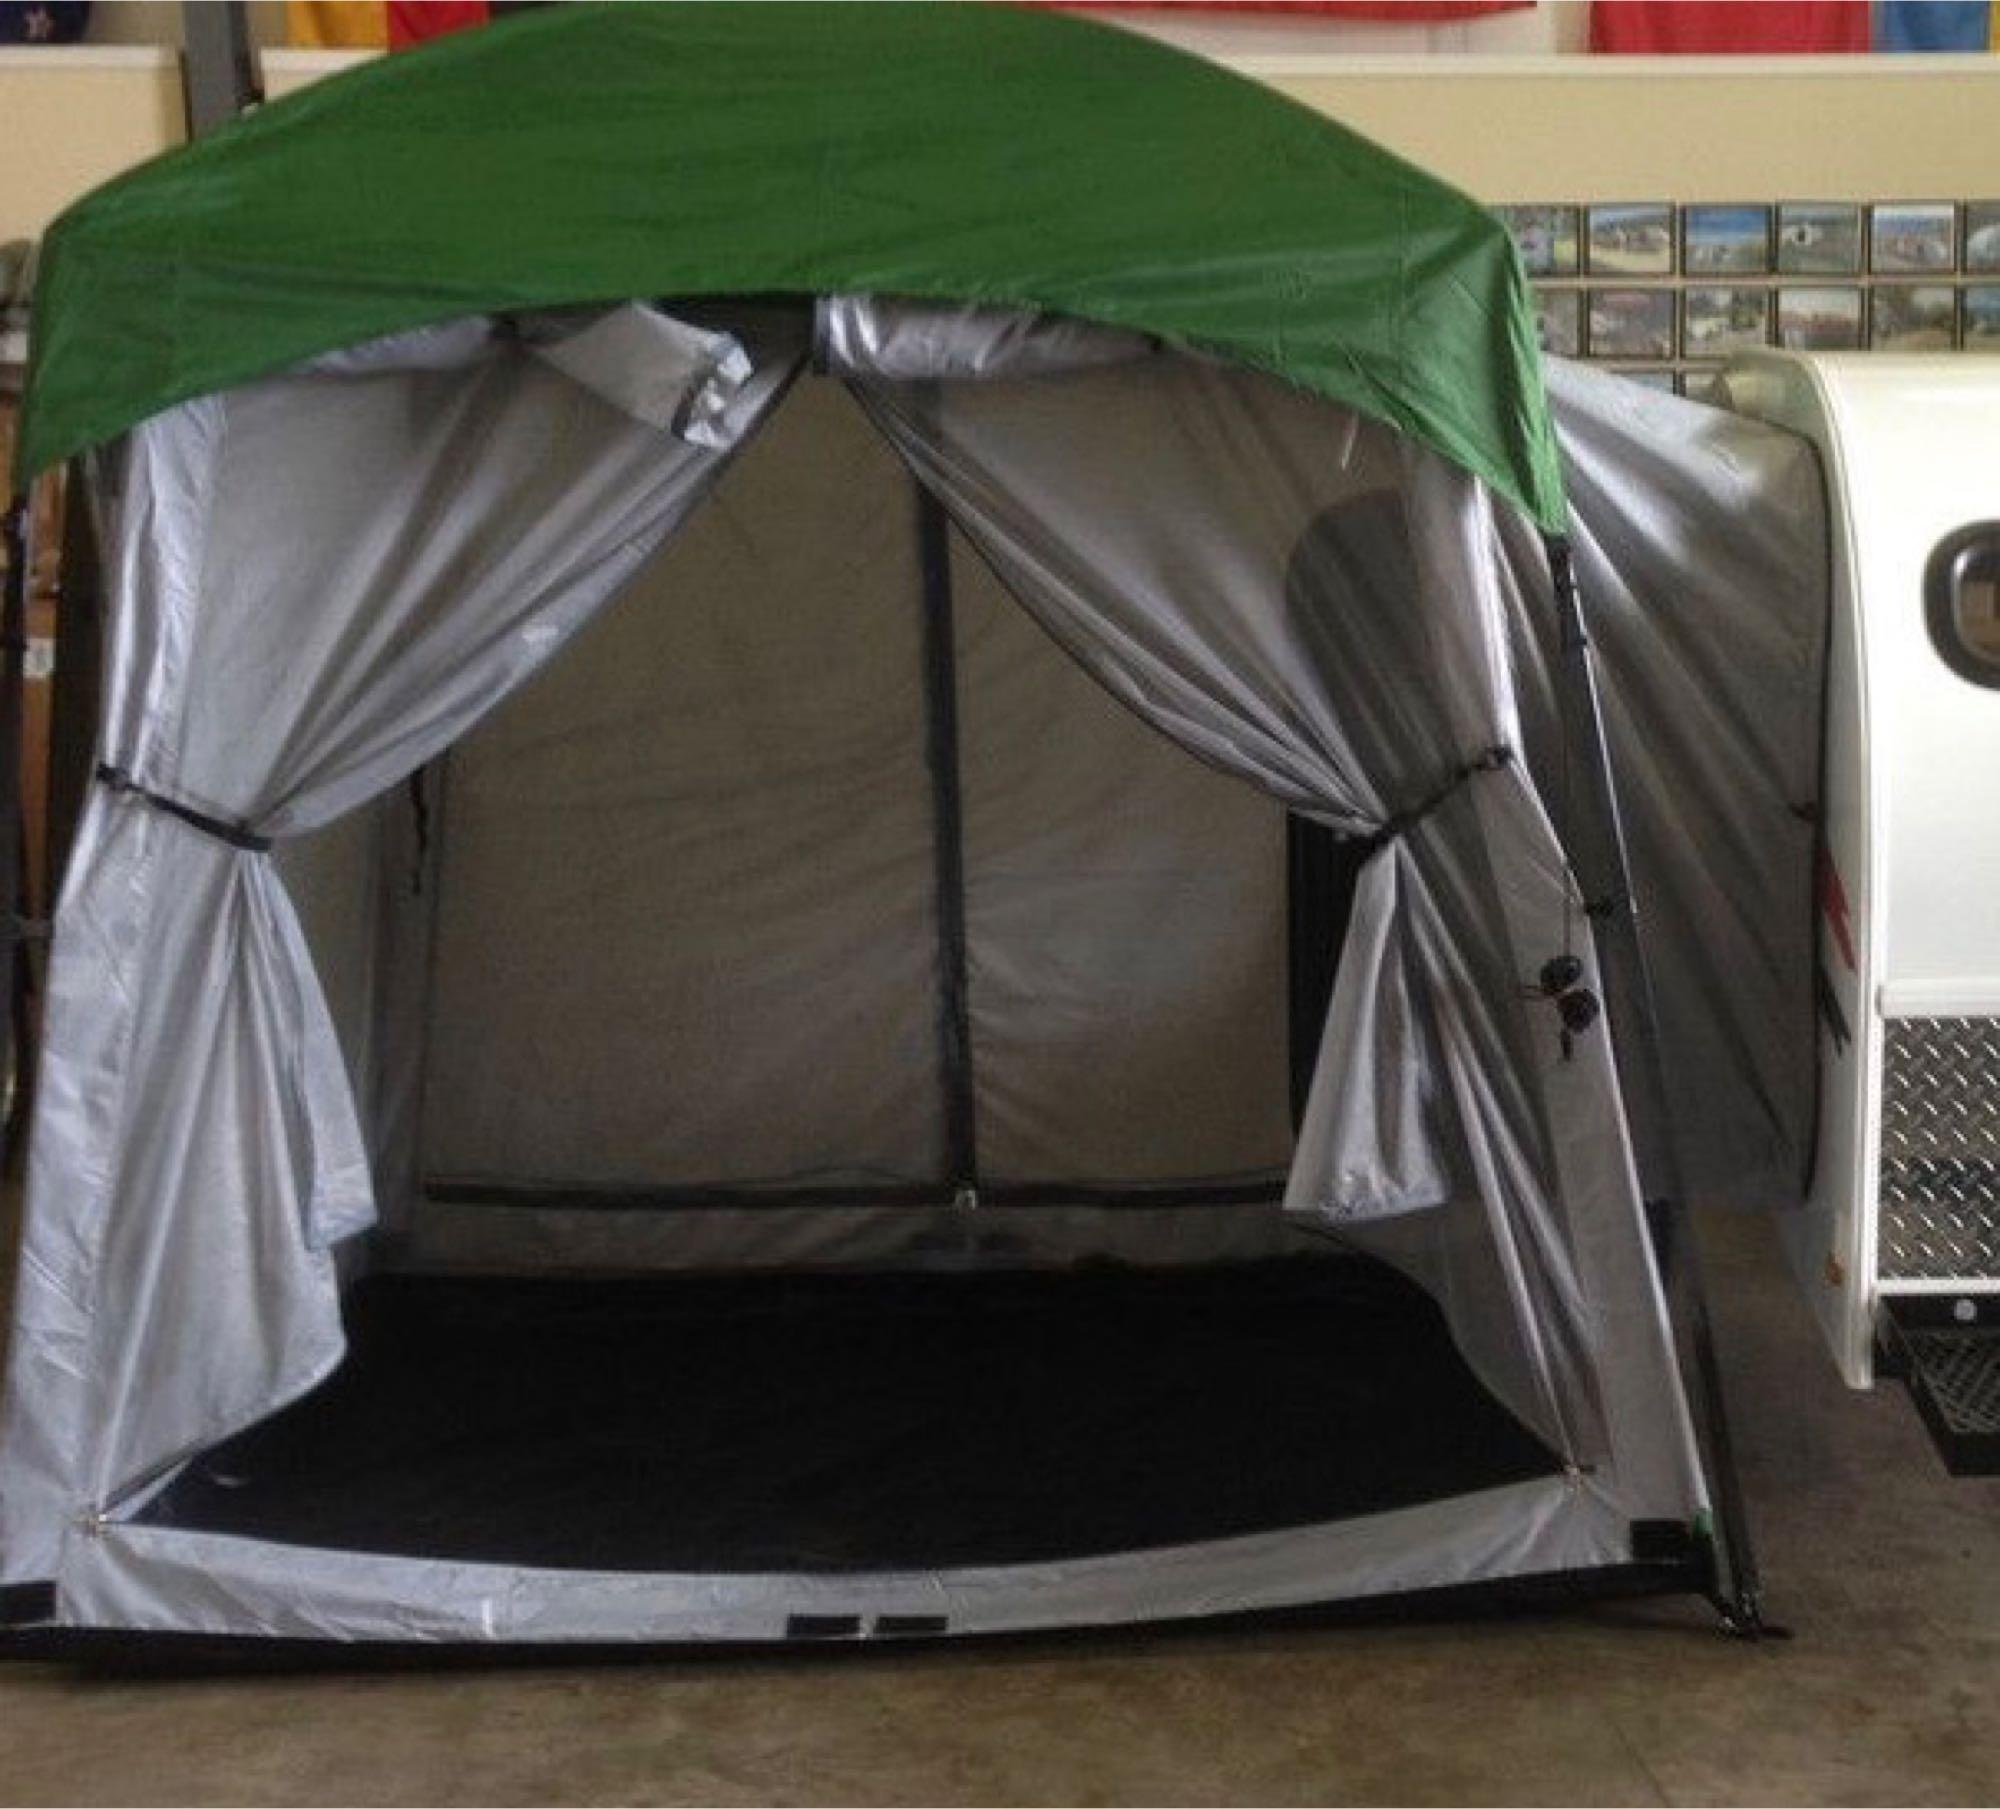 8 x 5' side tent. LittleGuy LittleGuy5Wideroughrider 2016